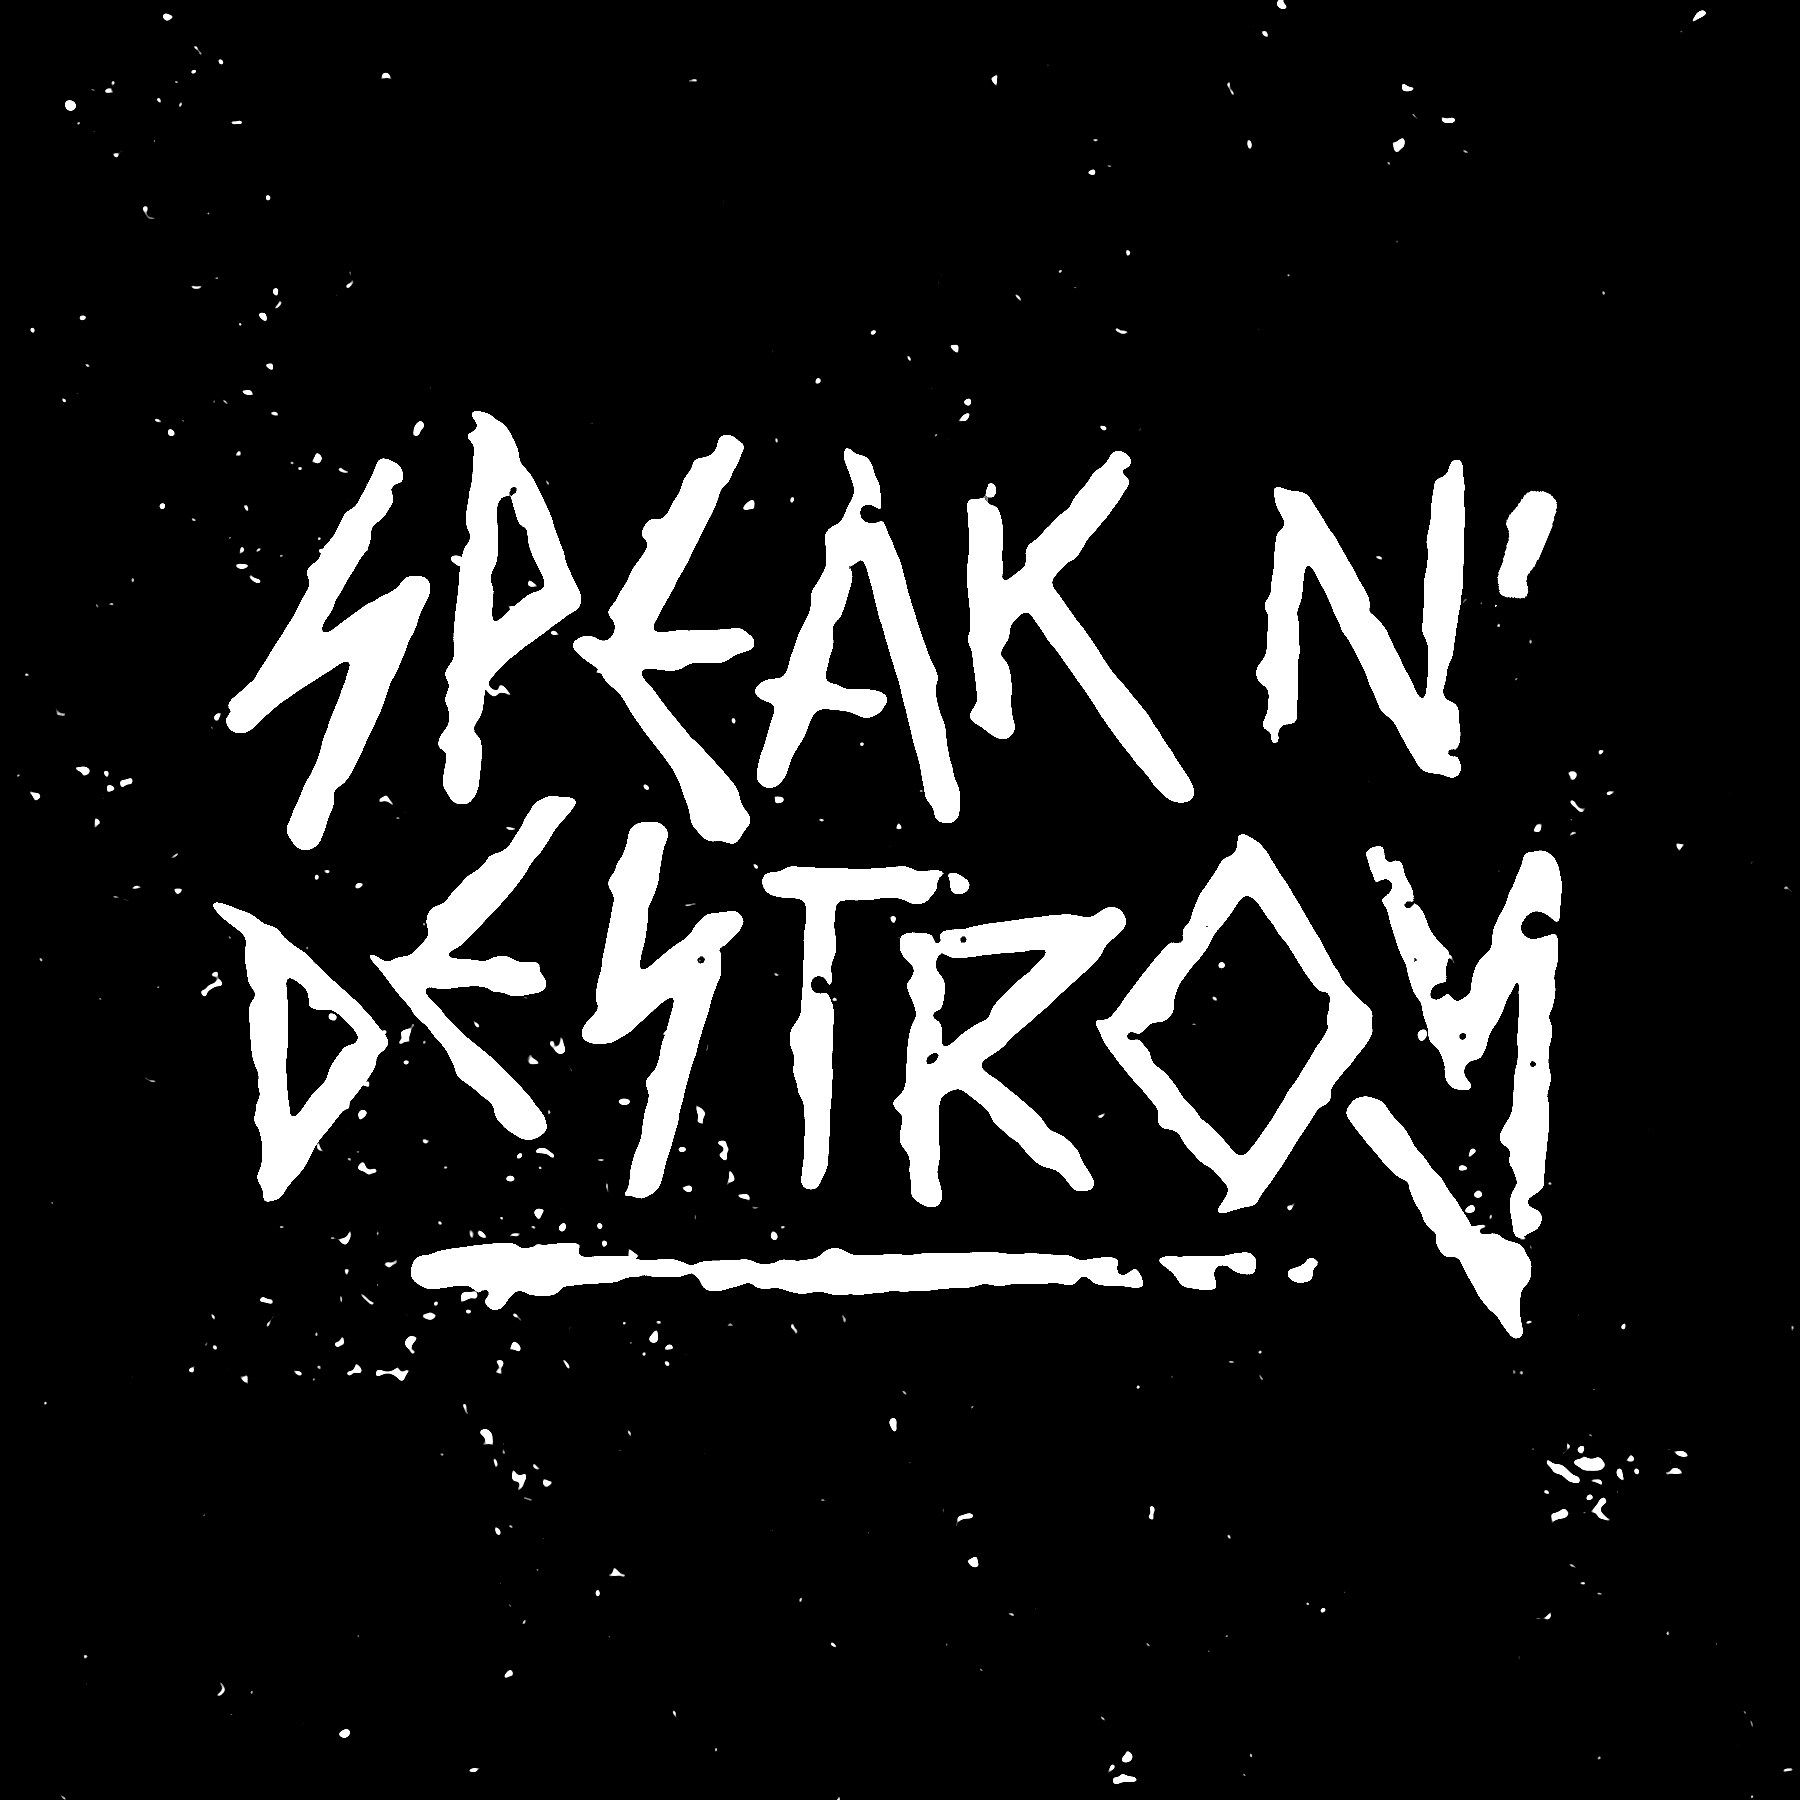 Speak N' Destroy Logo